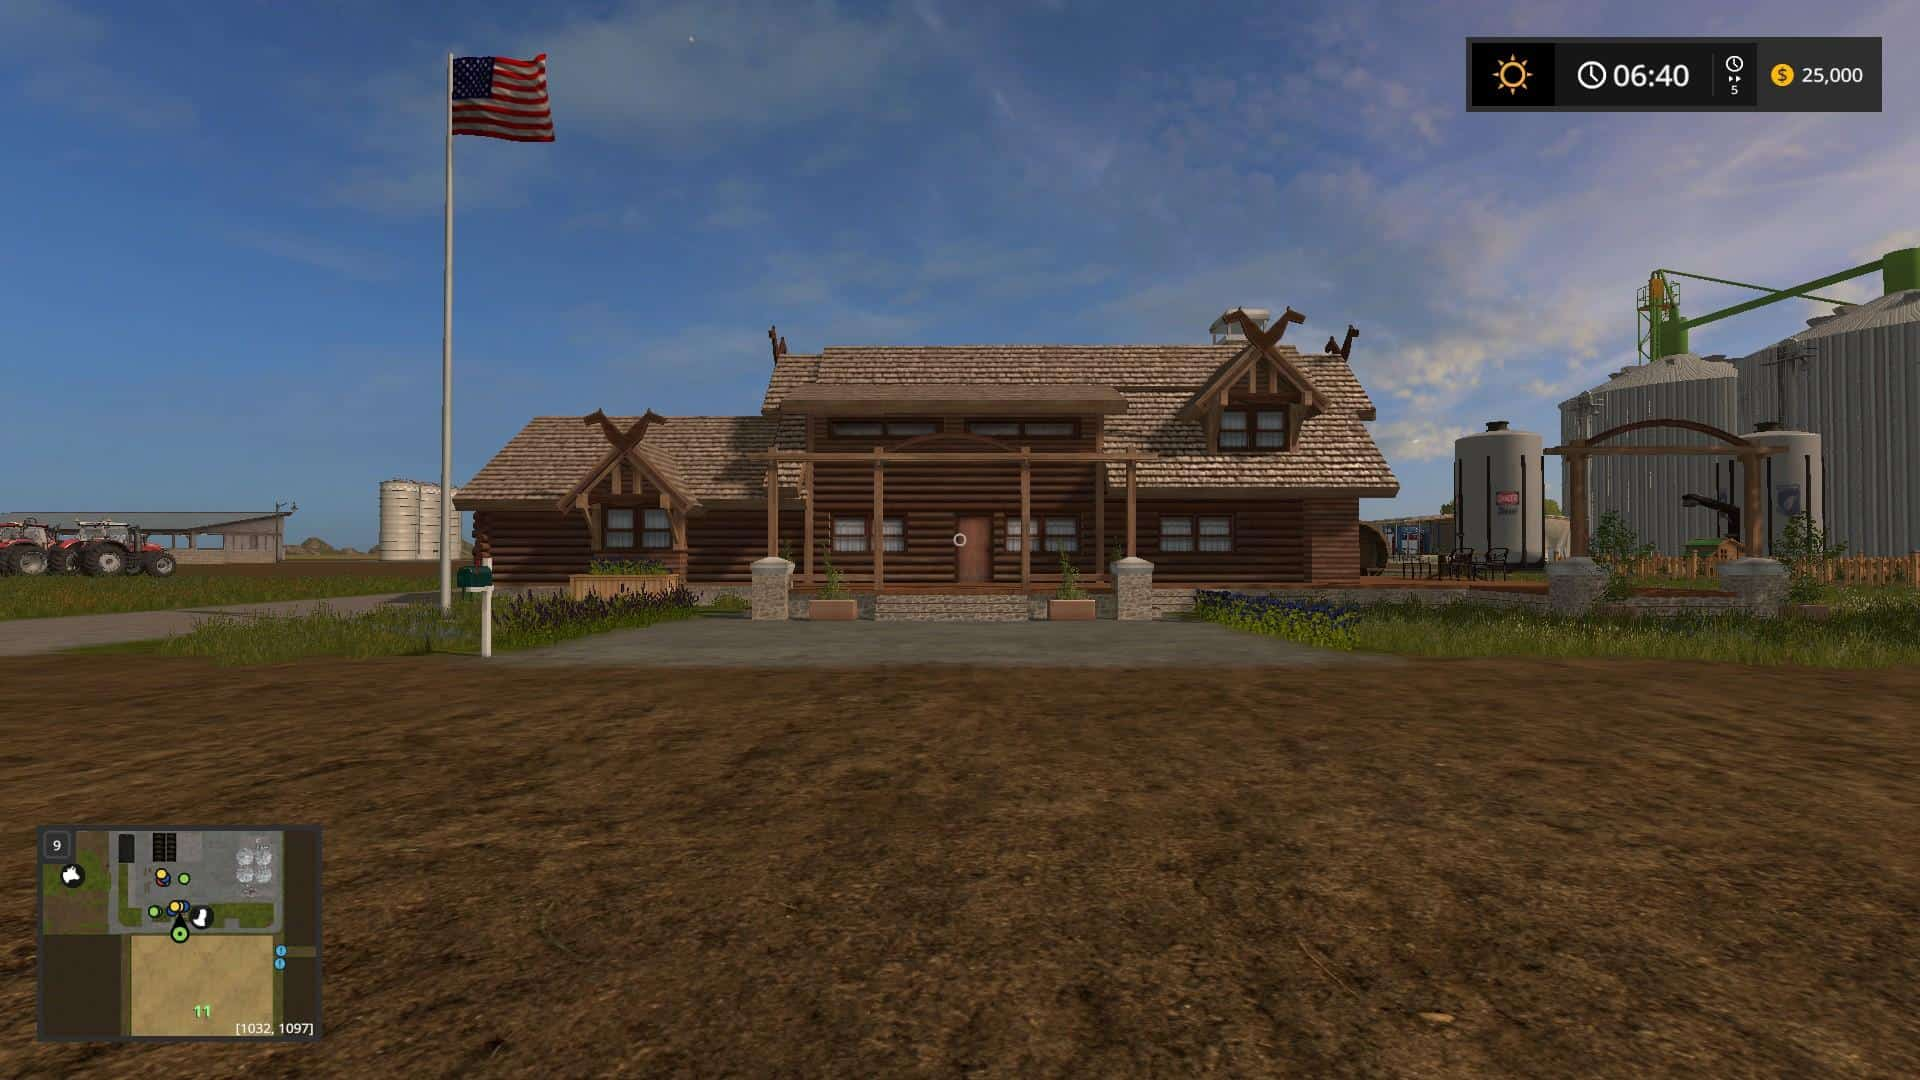 Farming Simulator 19 / 2019 Top 10 Maps | Farming Simulator